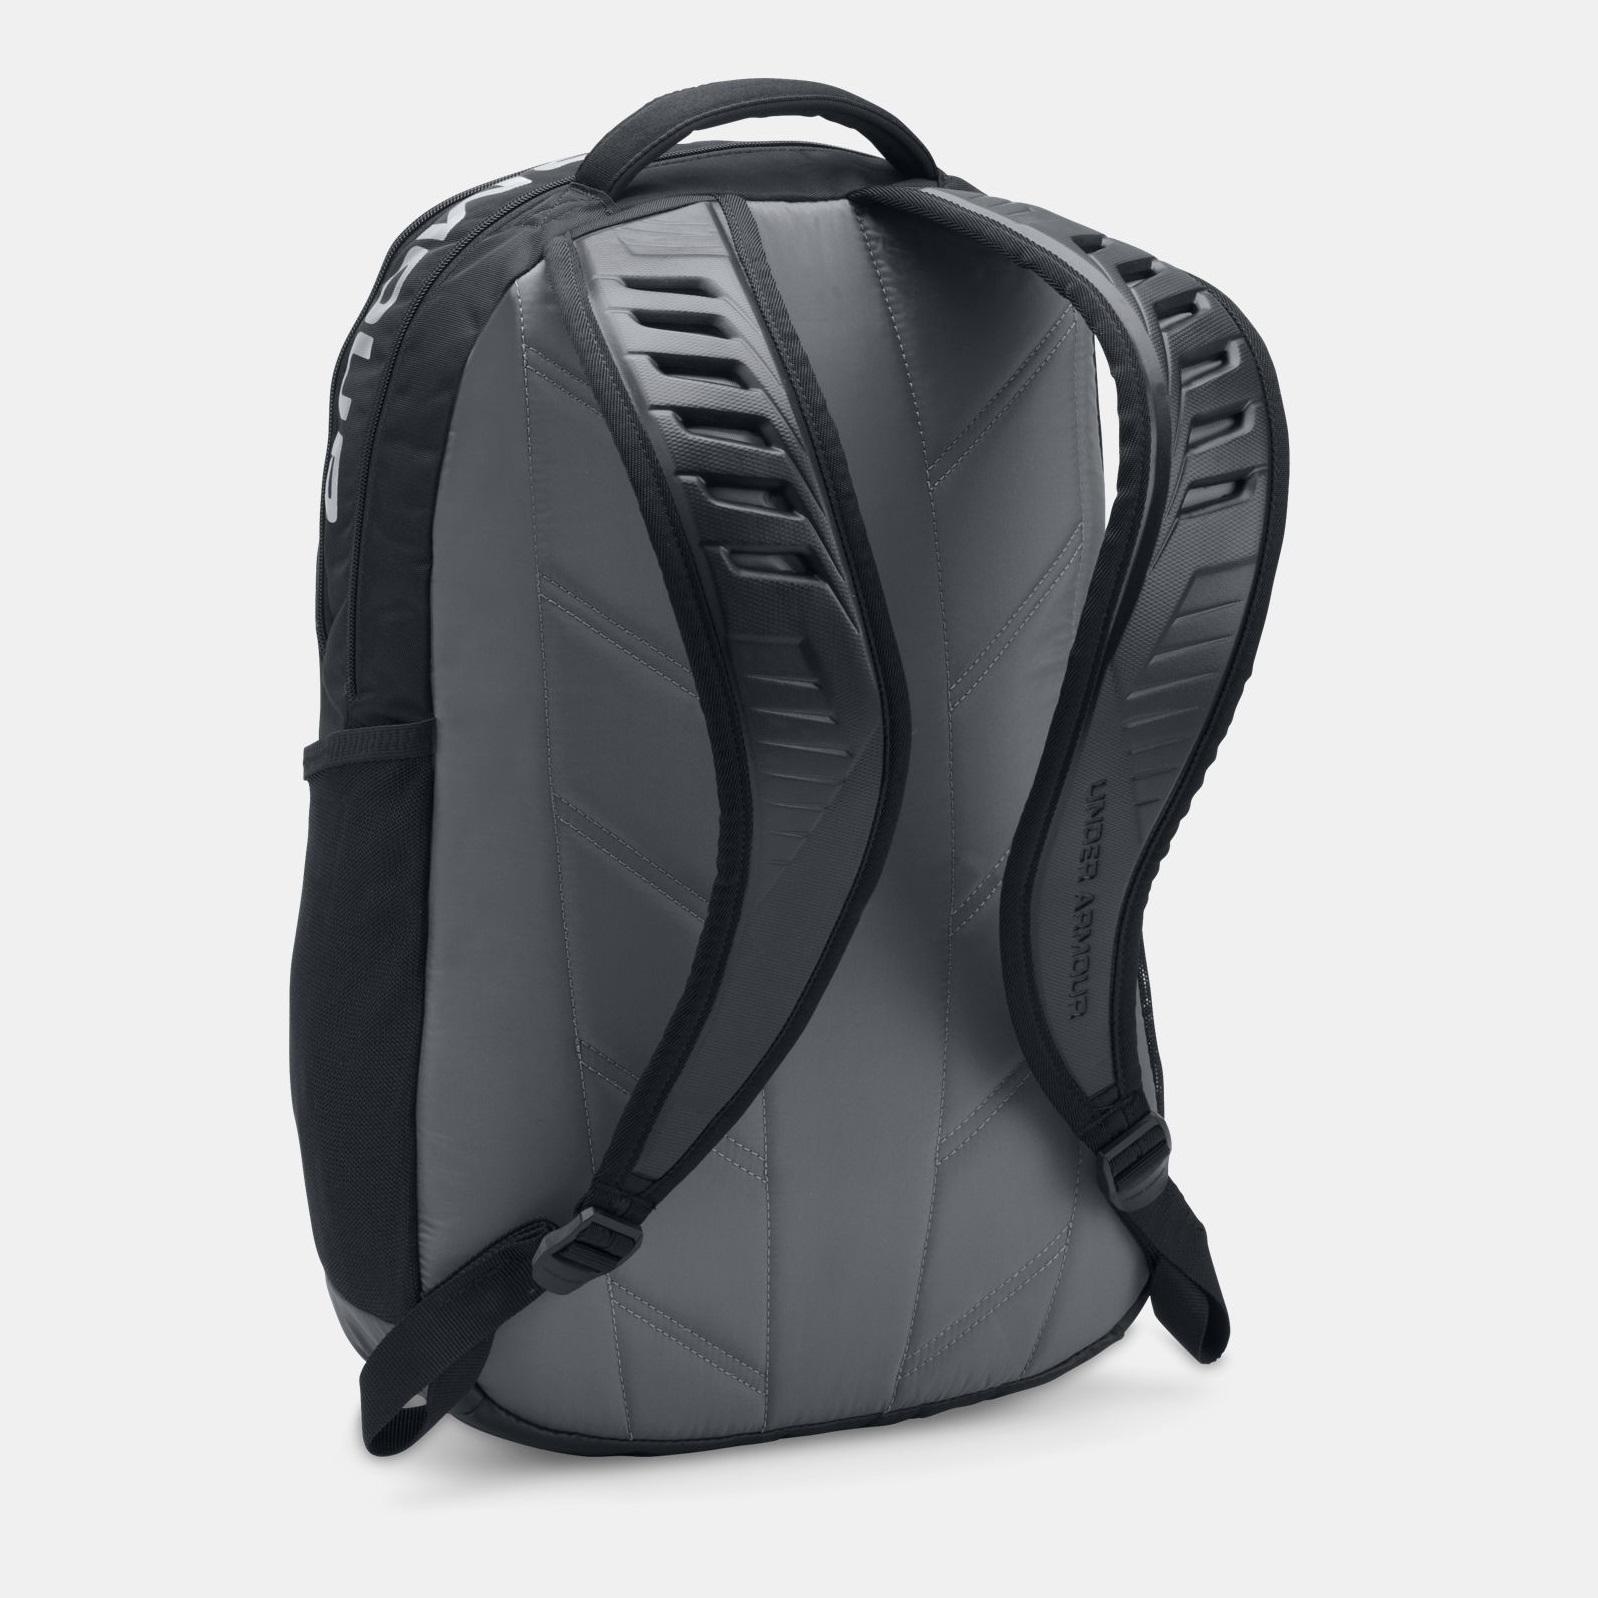 63c9df771f Rucsaci & Genti | Under armour UA Big Logo 5.0 Backpack 0296 | Fitness